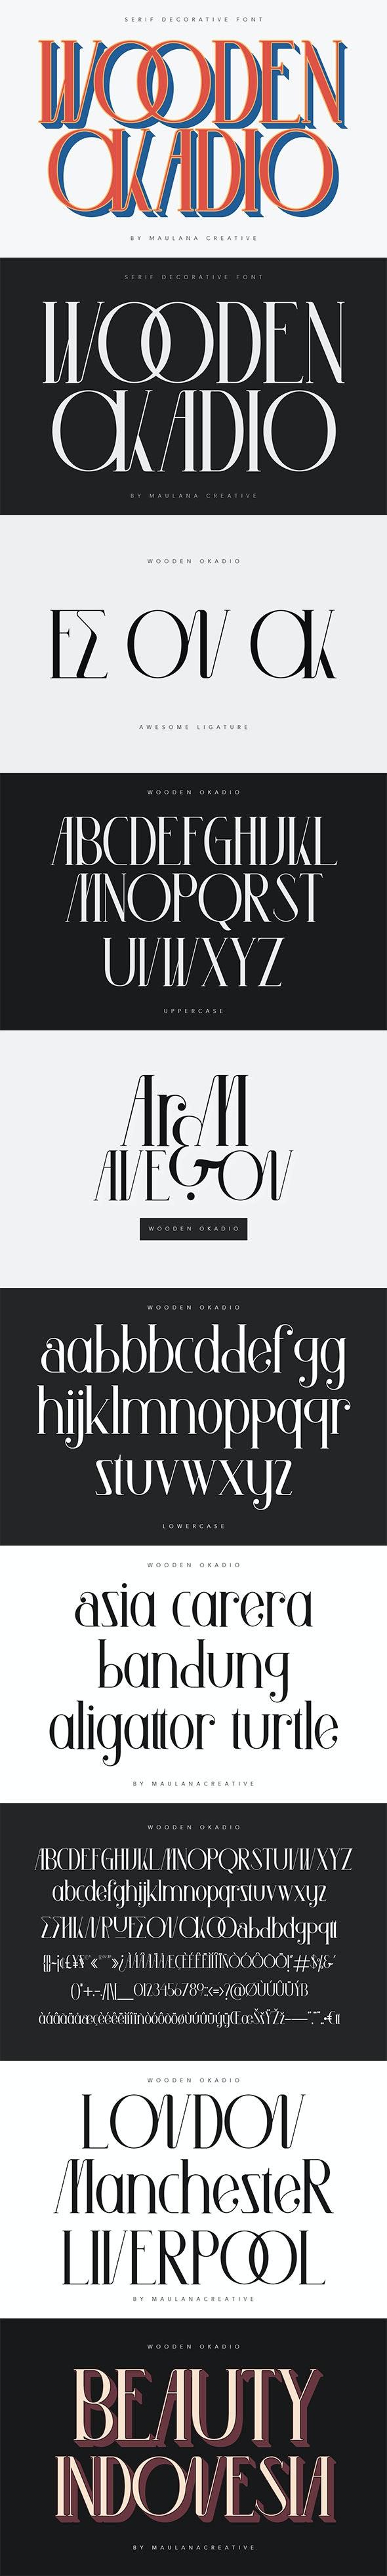 Wooden Okadio Serif Decorative Font - Serif Fonts